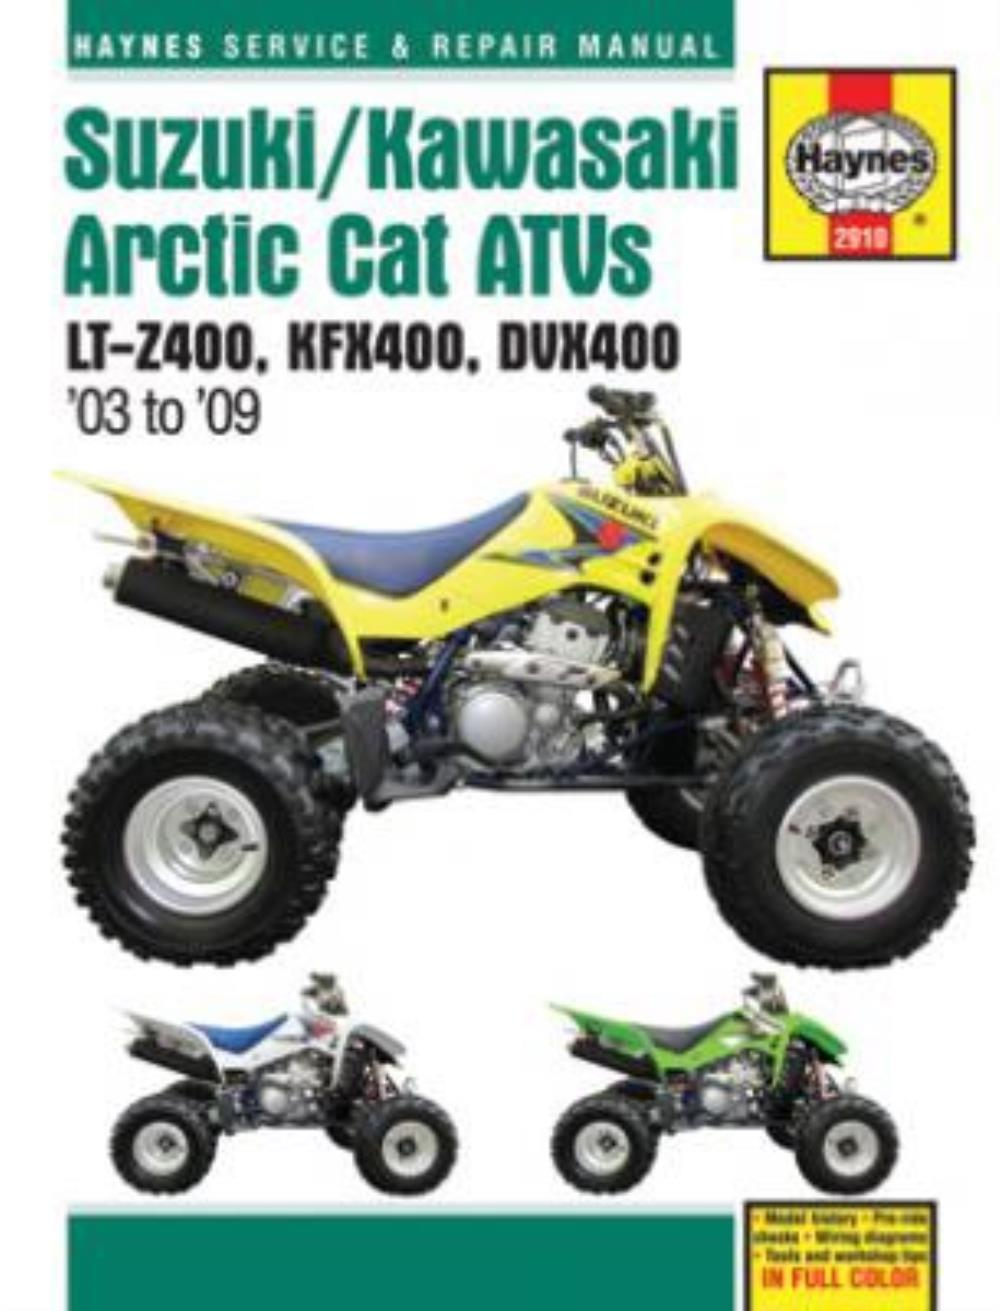 Workshop Manual Suzuki LTZ400 03-09, Kawasaki KFX400 03-06